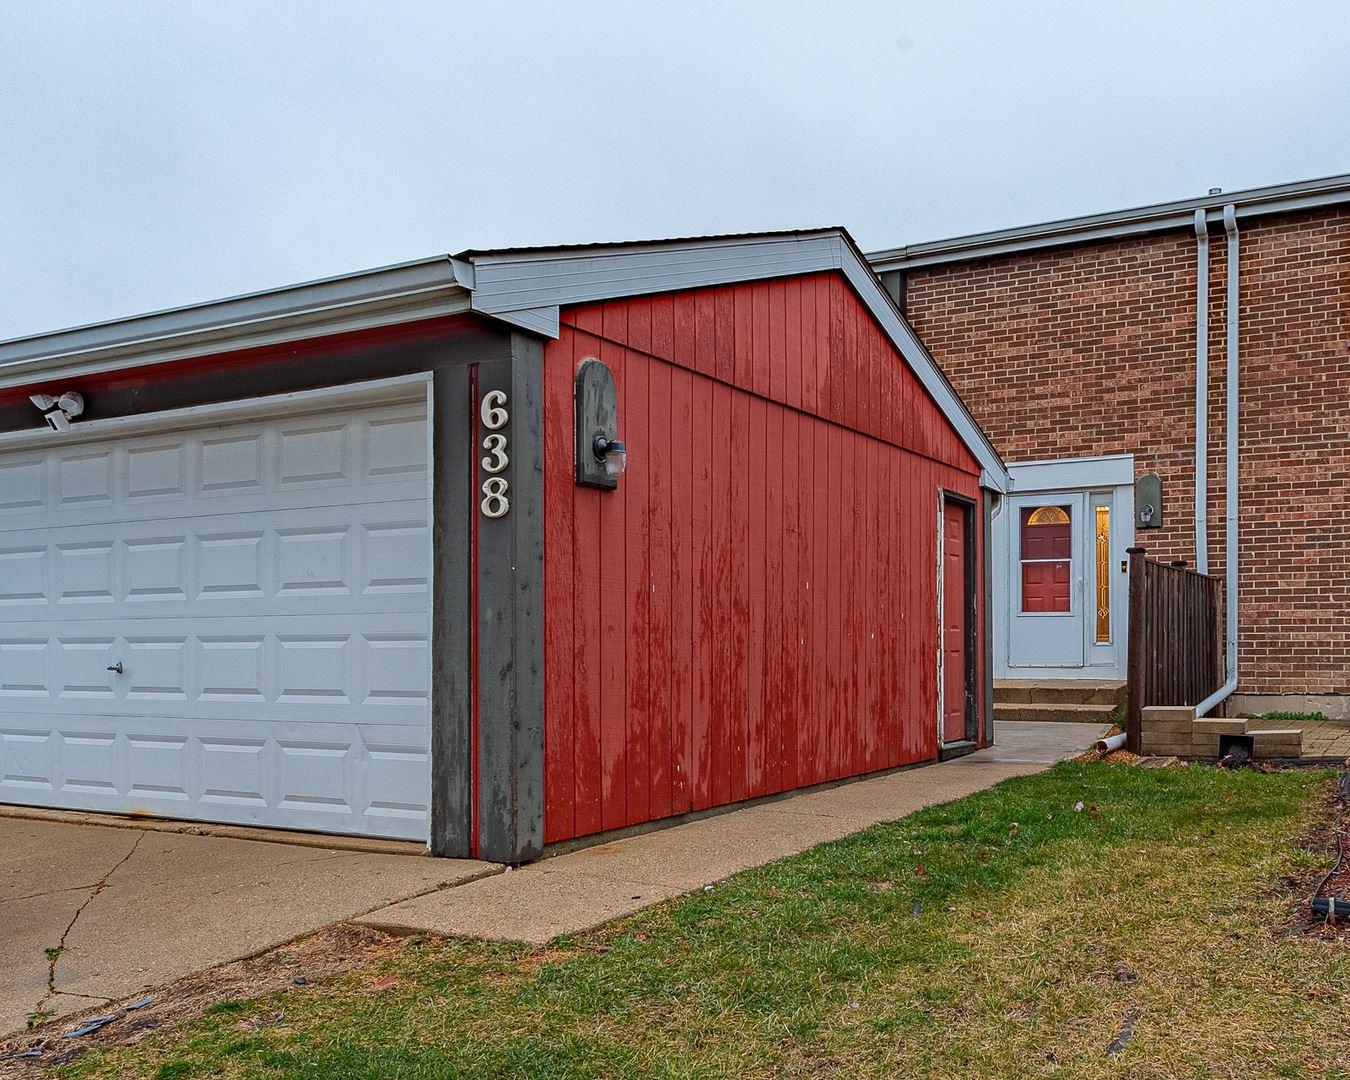 Photo of 638 Sundance Drive, Bolingbrook, IL 60440 (MLS # 10921947)